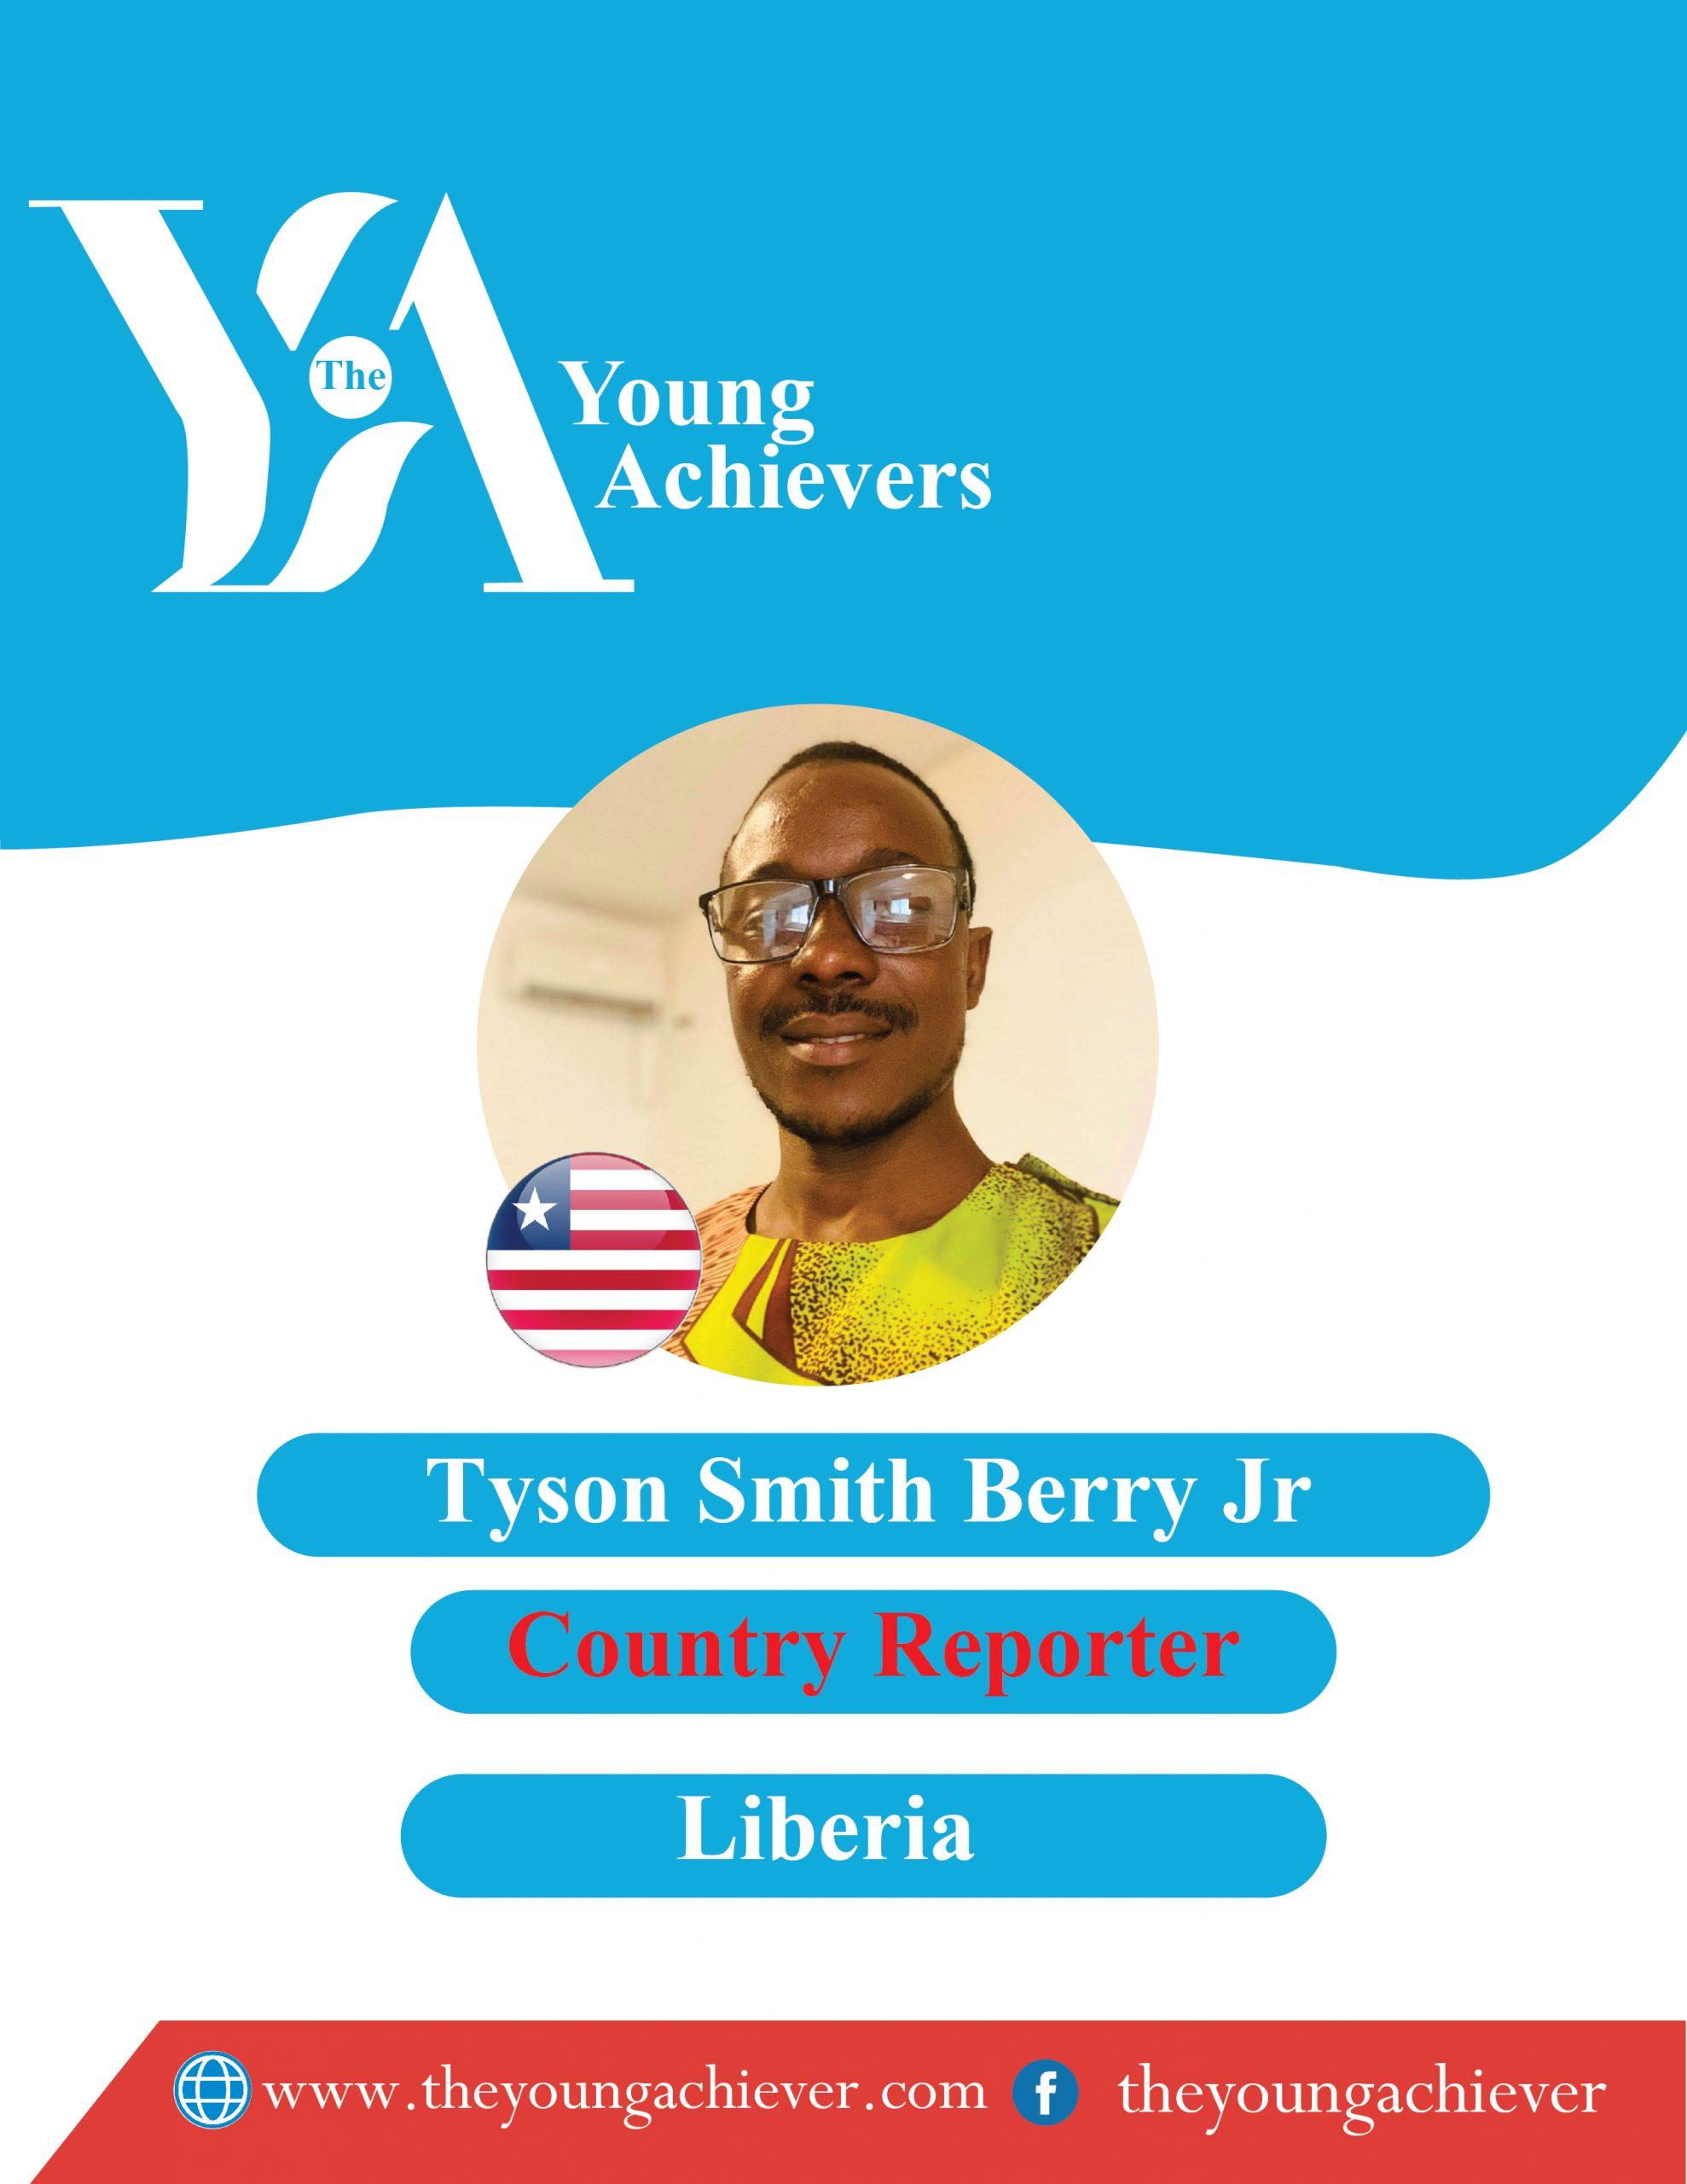 Tyson Smith Berry Jr